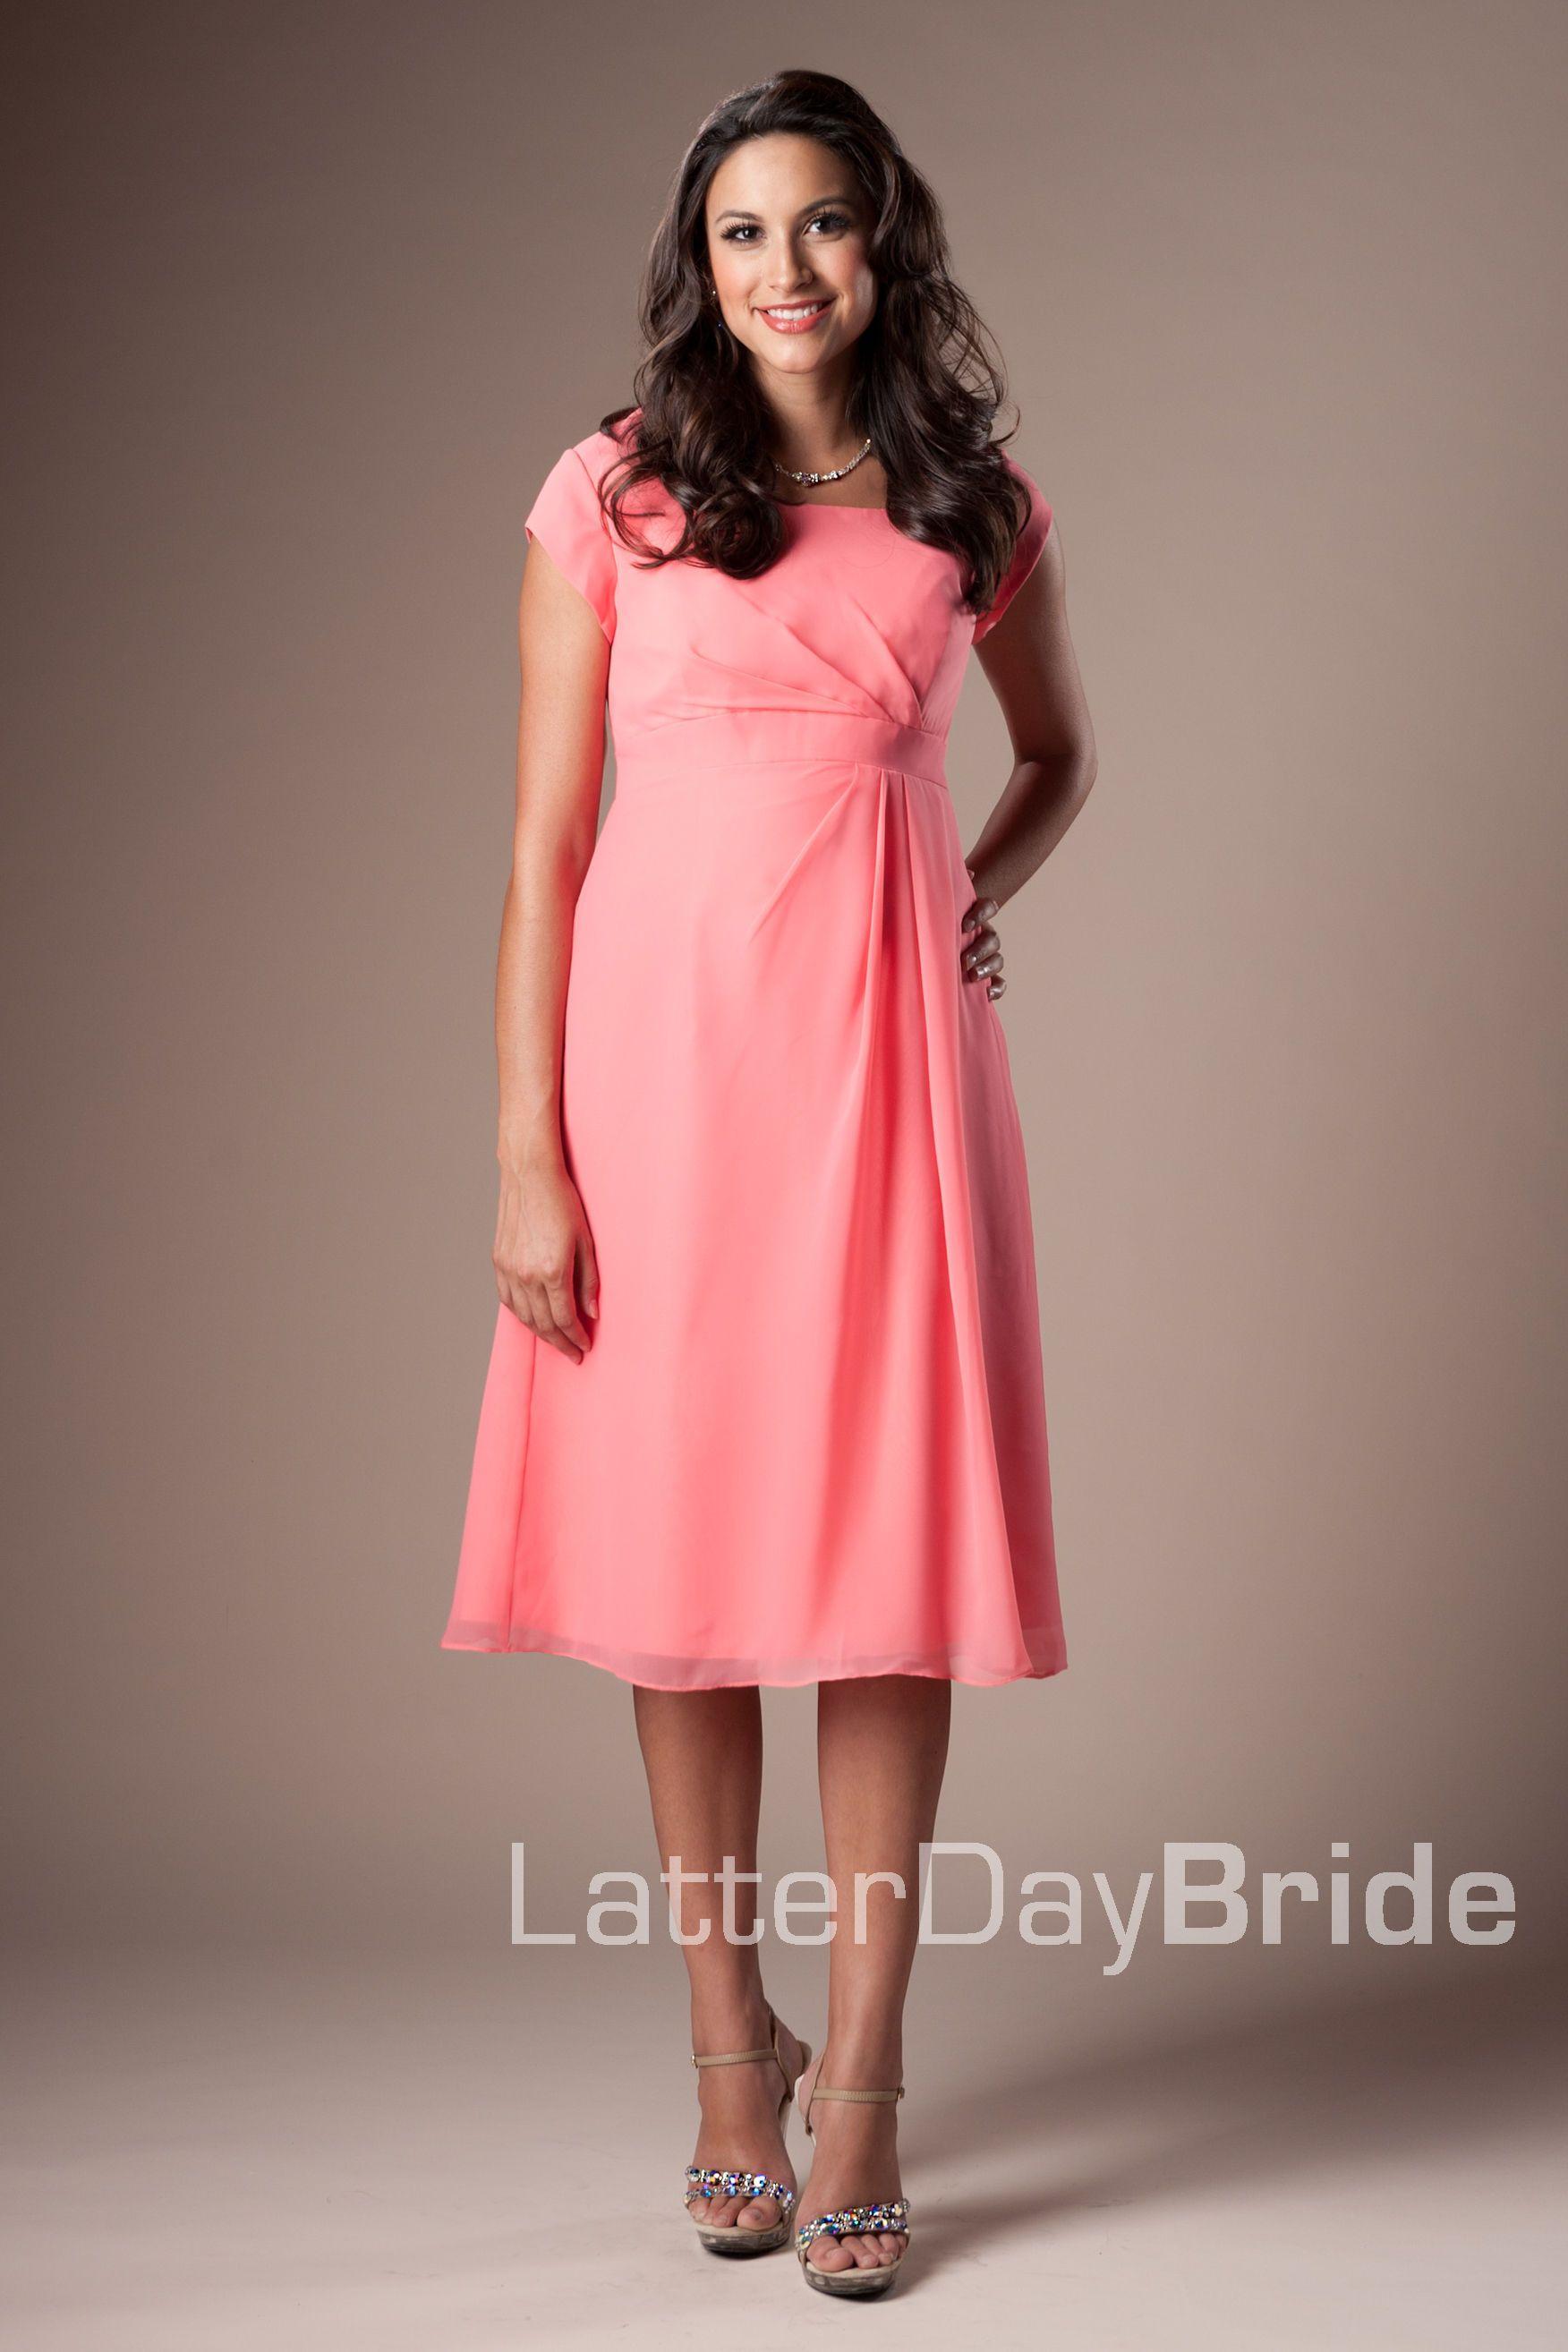 Special Occasion | Fashion | Pinterest | Damas de boda, Damas y Boda